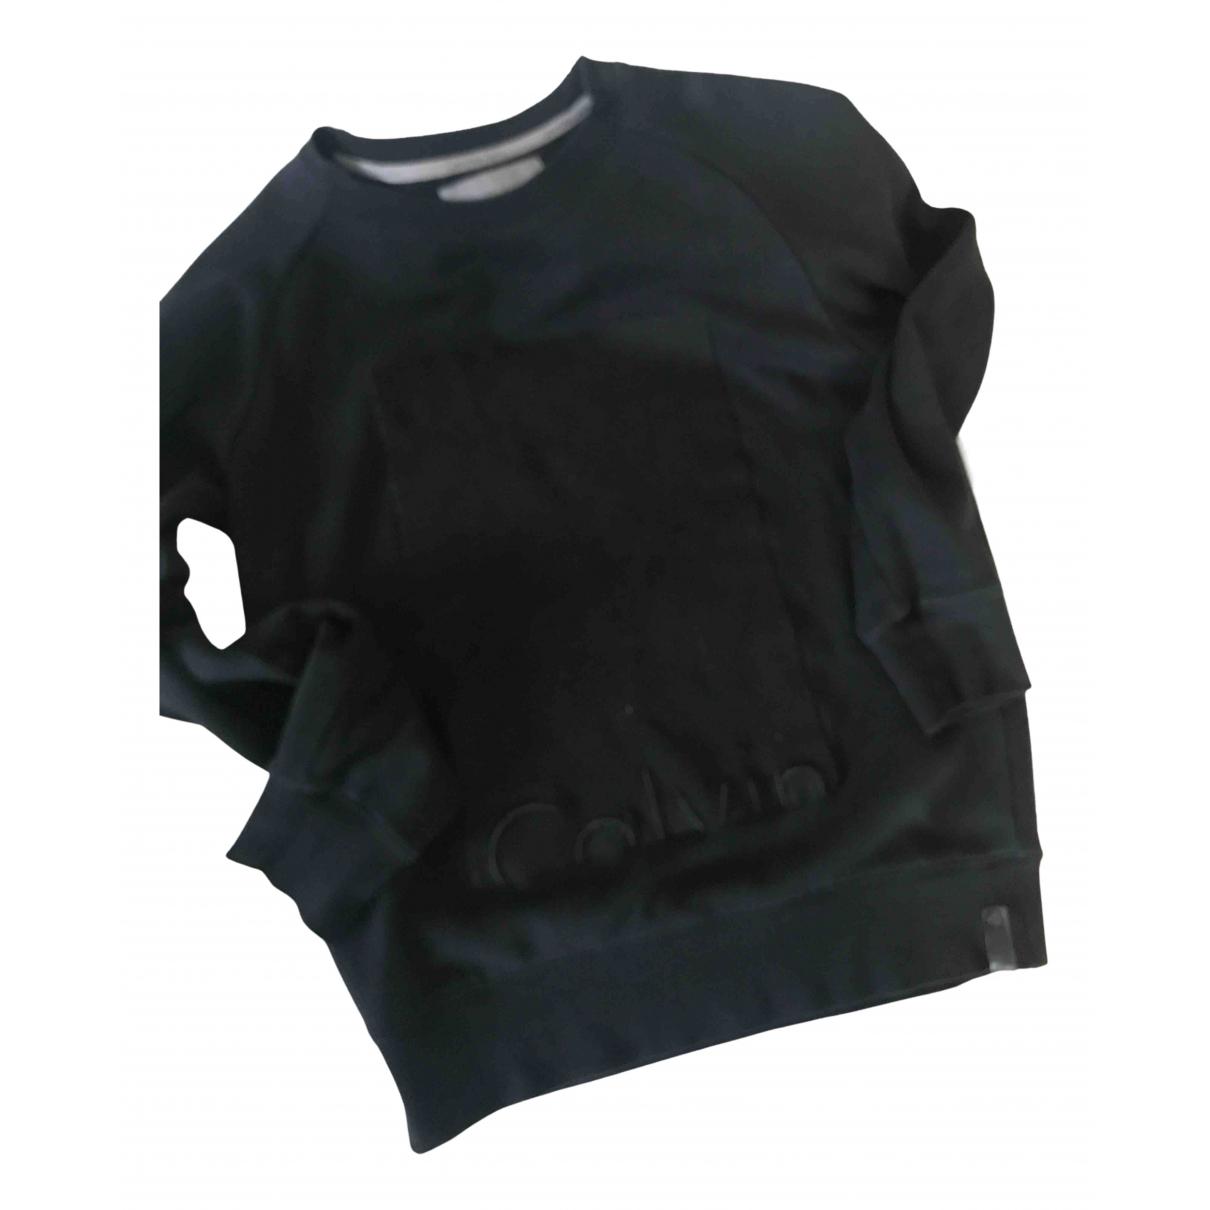 Calvin Klein \N Black Cotton Knitwear & Sweatshirts for Men S International